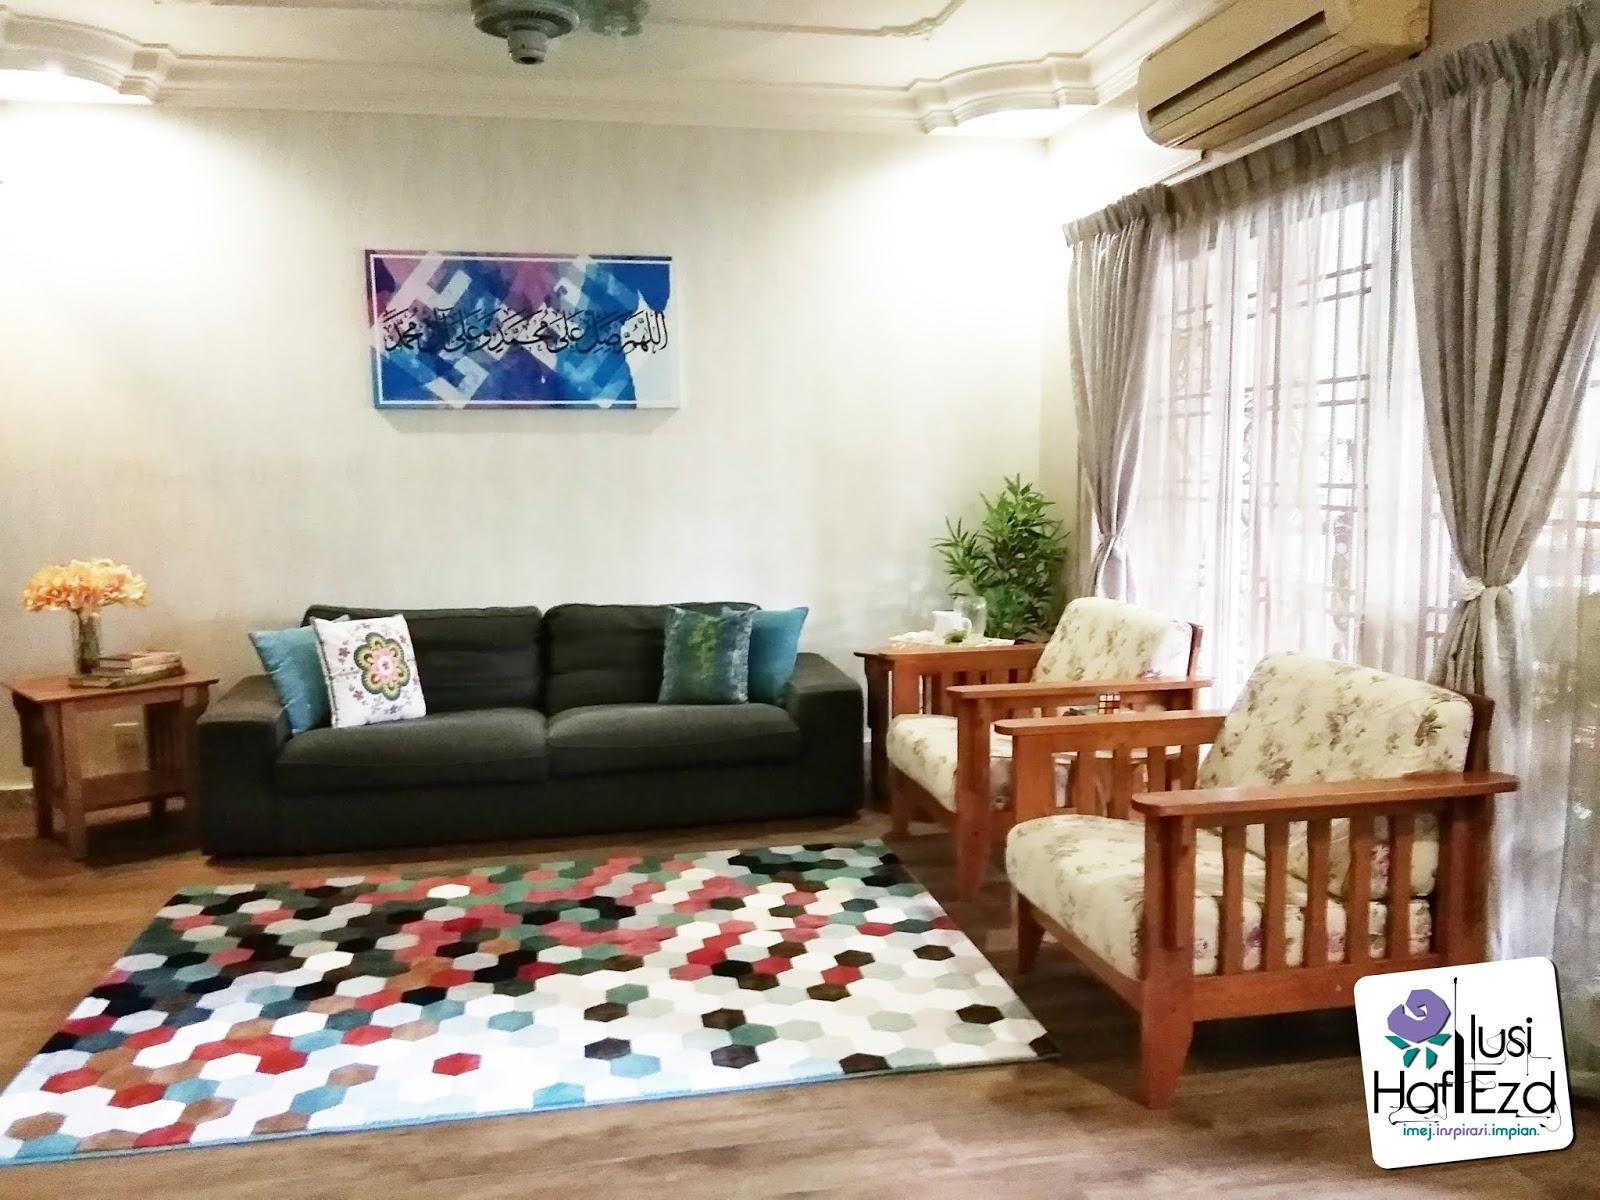 Lebih Berwarna Warni Dan Ceria Ruang Belajar Solat Juga Telah Diberi Nafas Baru Dengan Kerusi Meja Yang Bersama Canvas Frame Quotes